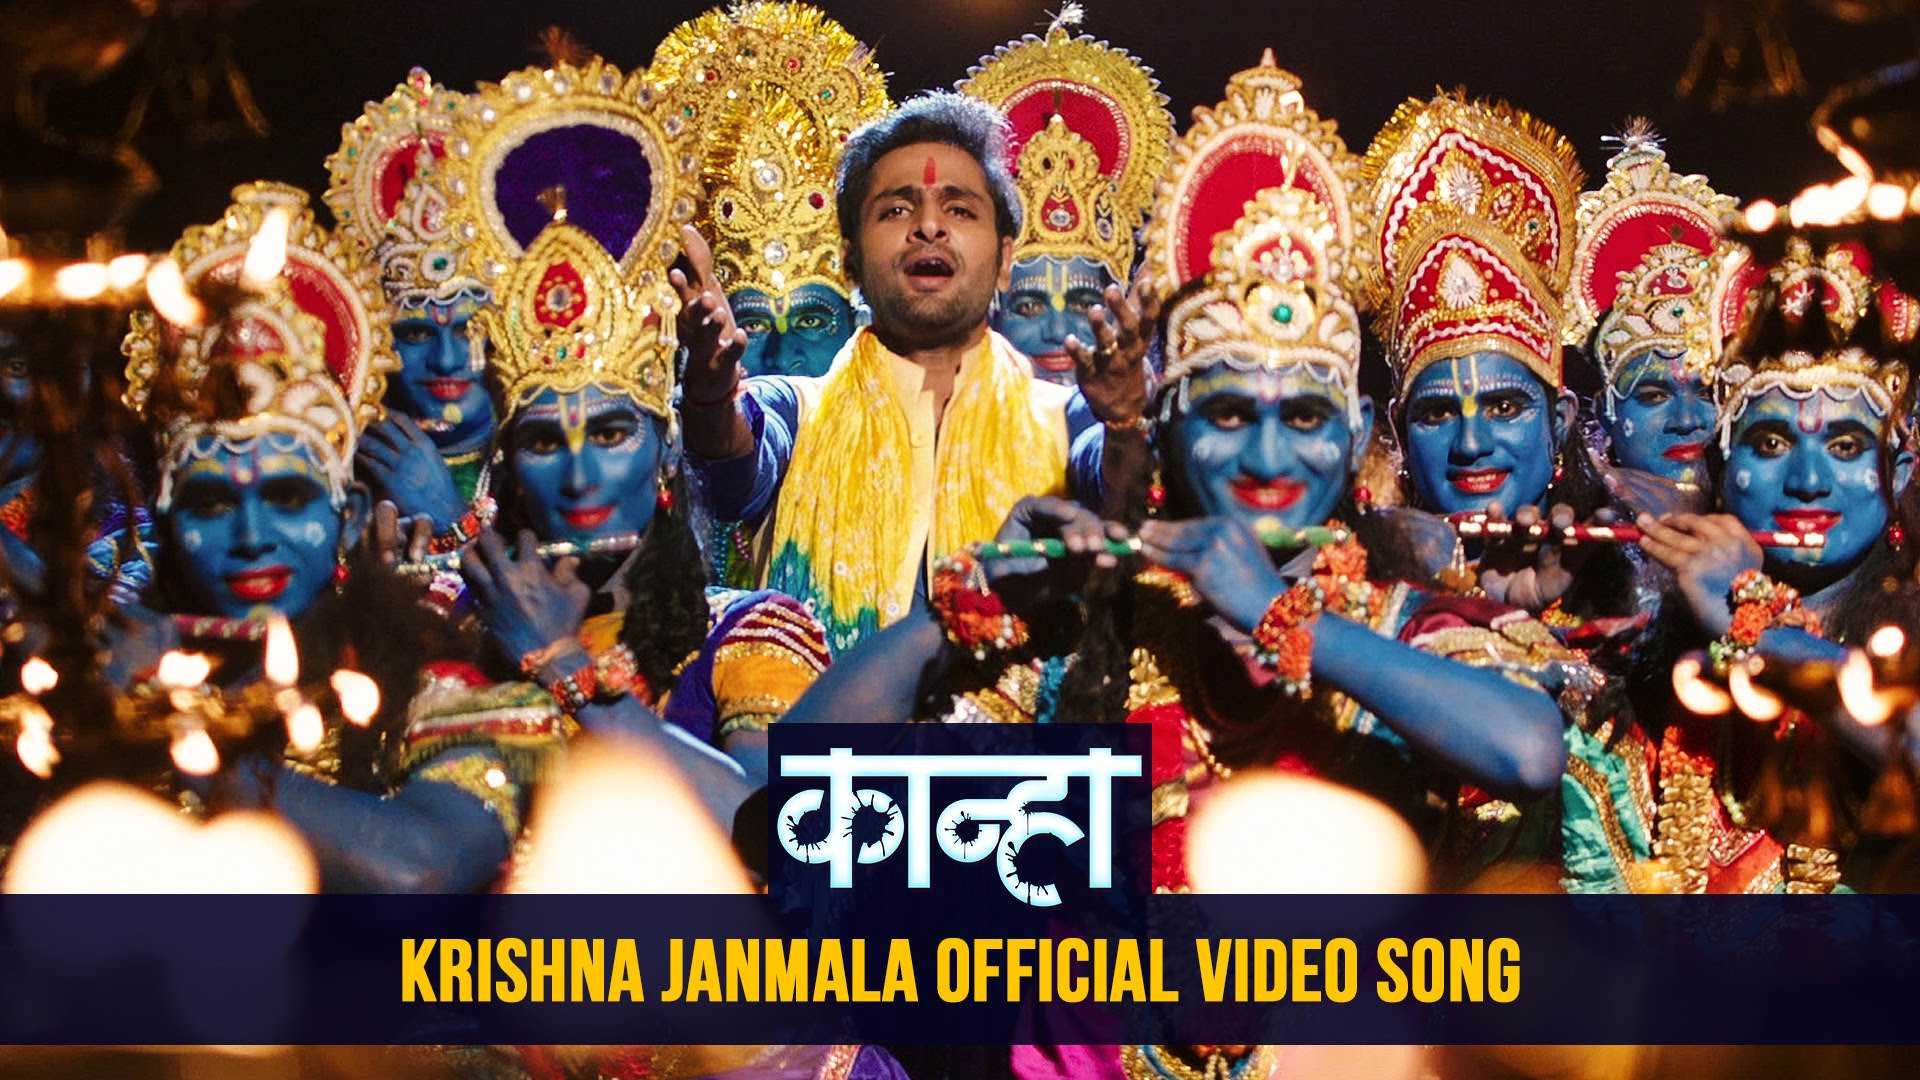 Krishna Janmala: a festive marathi song from Kanha Movie